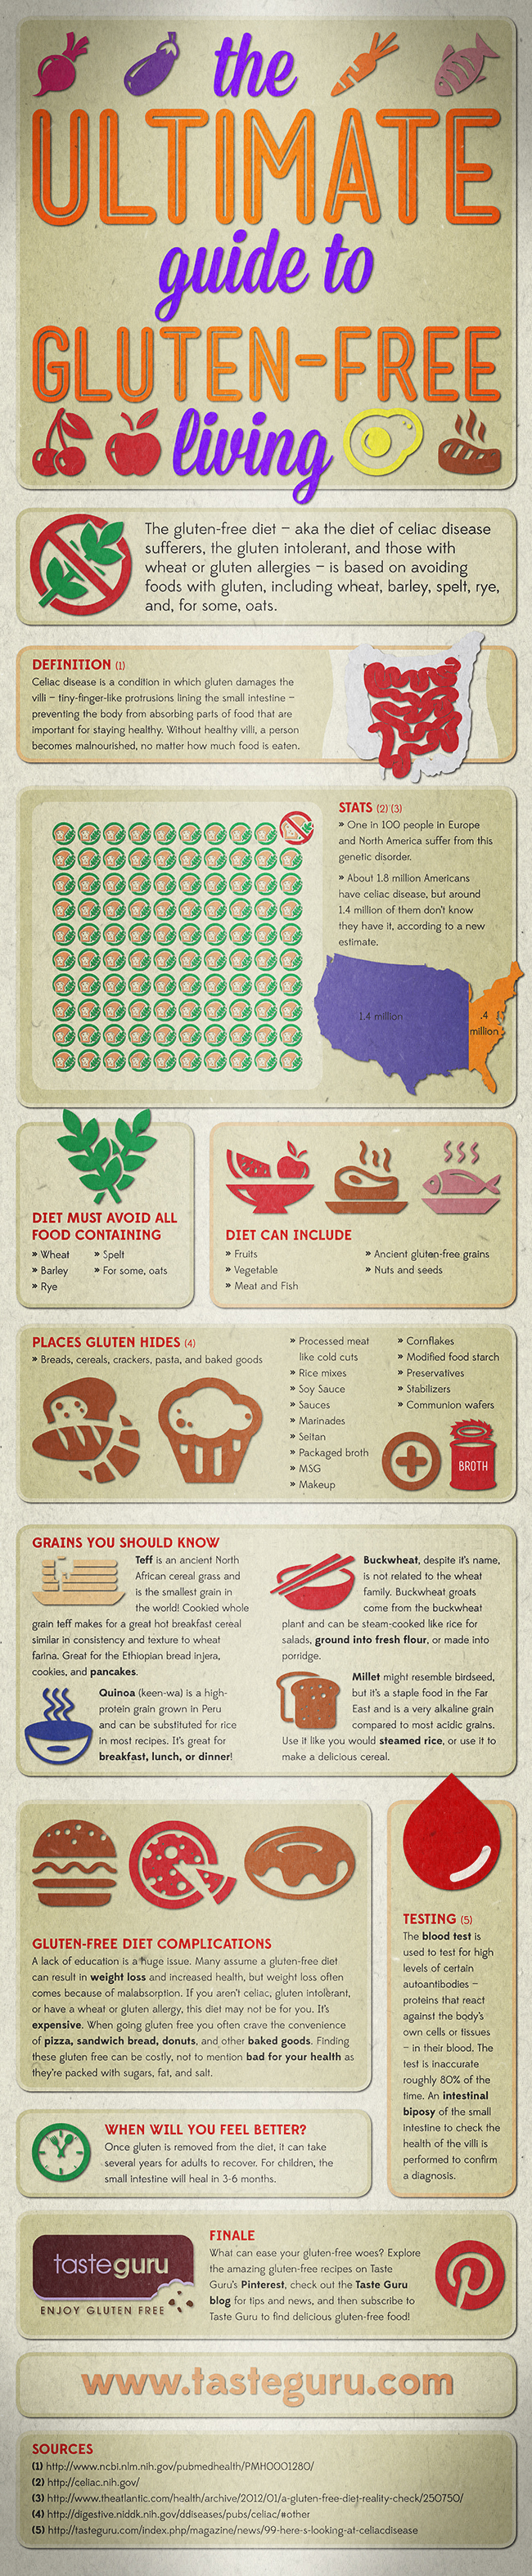 the-ultimate-guide-to-glutenfree-living_50e2c2e4ab721